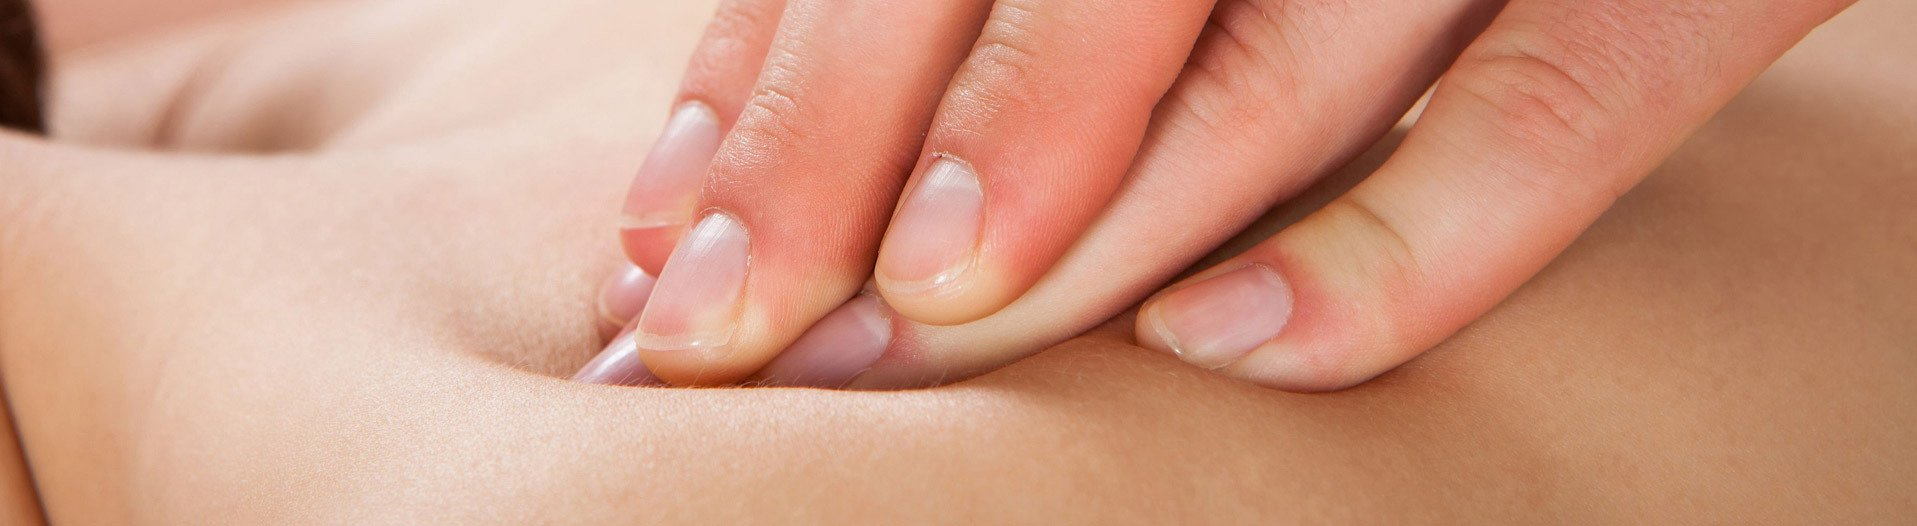 "<img src=""2_massage_copy.jpg""width=""1917"" height=""846"" alt=""Massage Therapy""/>"